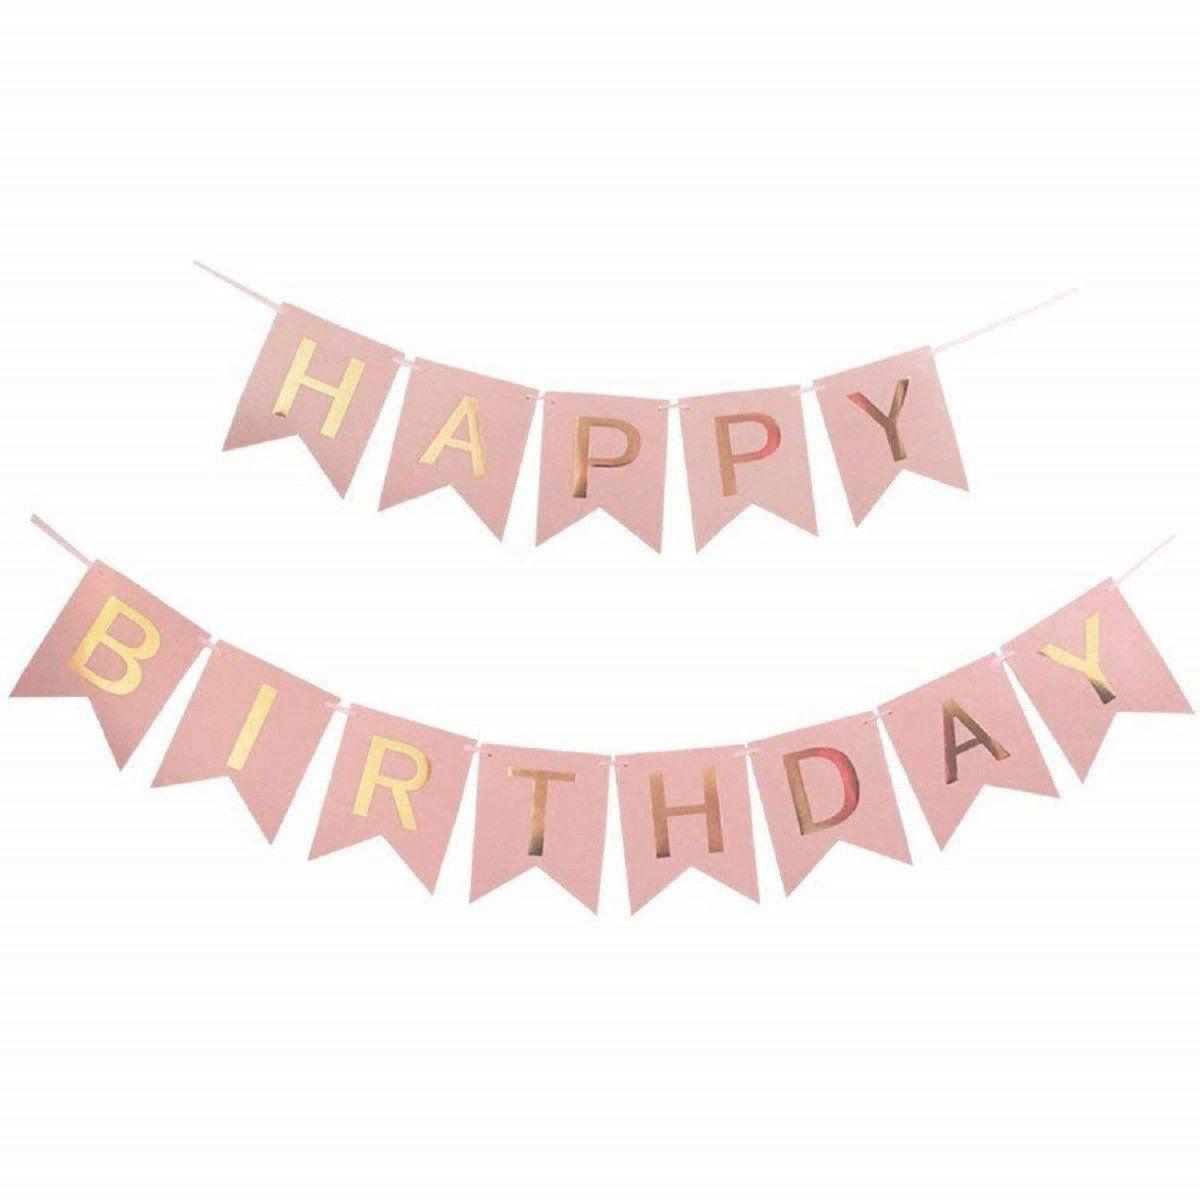 Pink Pom Poms Hanging Swirl Set, Happy Birthday Bunting Banner Party Decoration